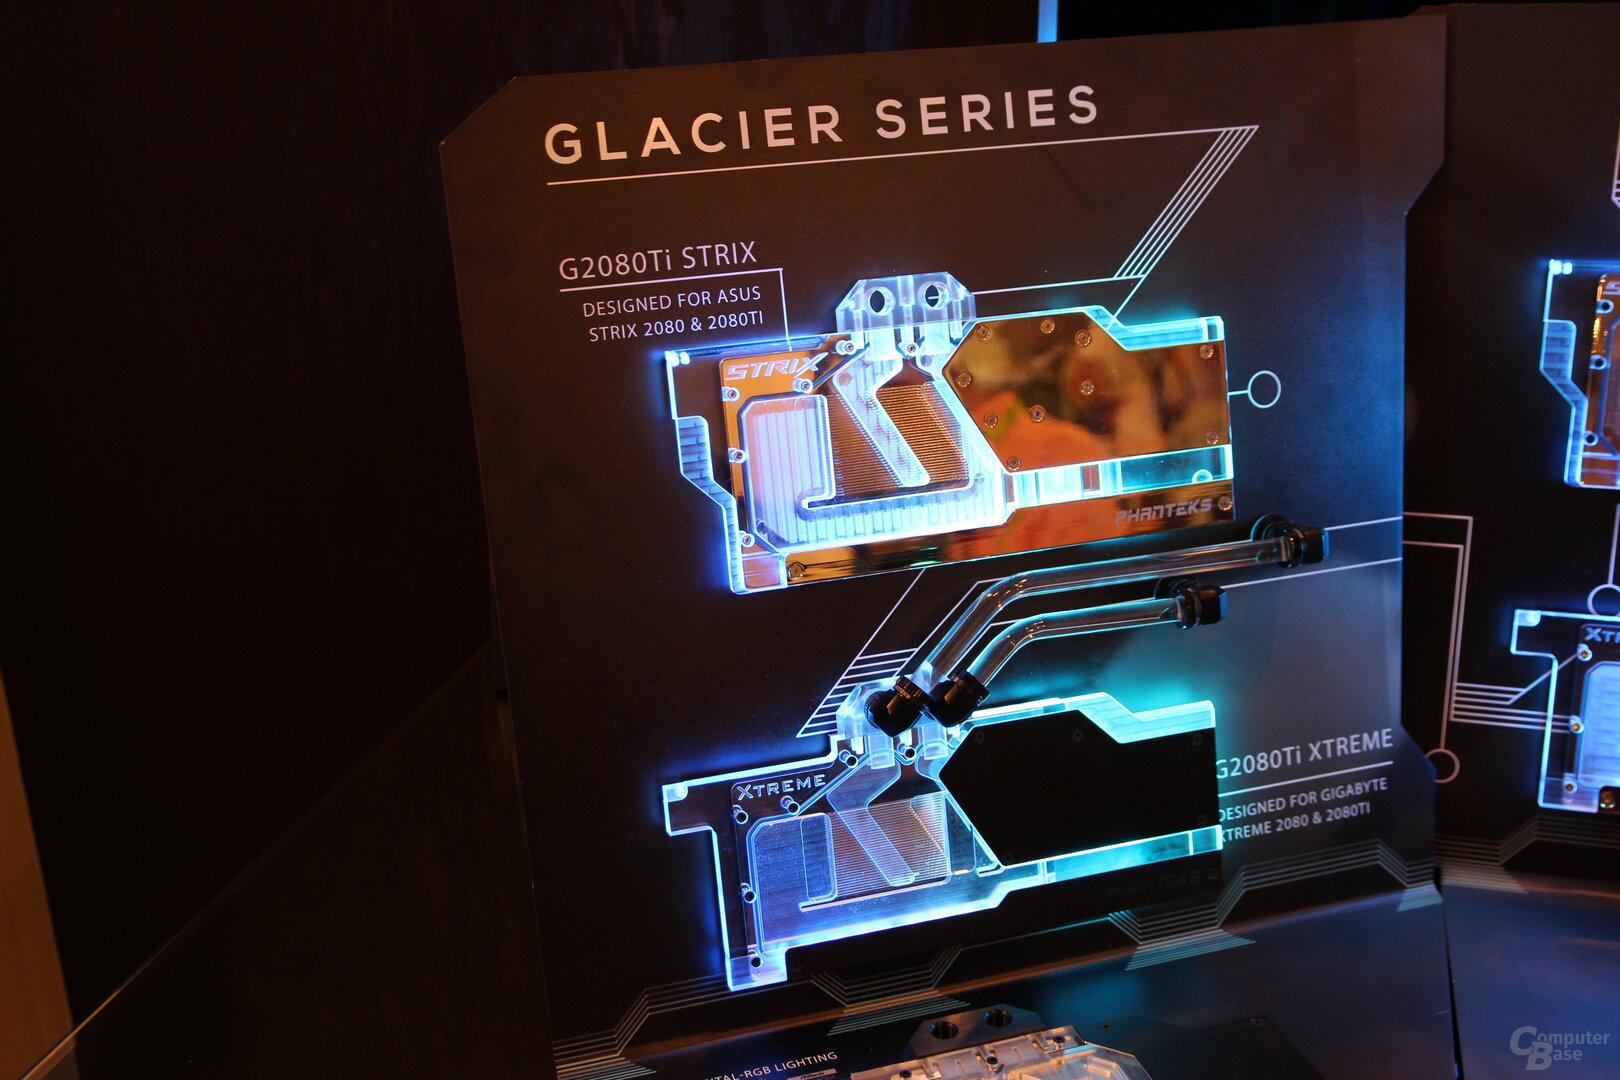 Phanteks Glacier G2080Ti Strix und Glacier G2080Ti Xtreme